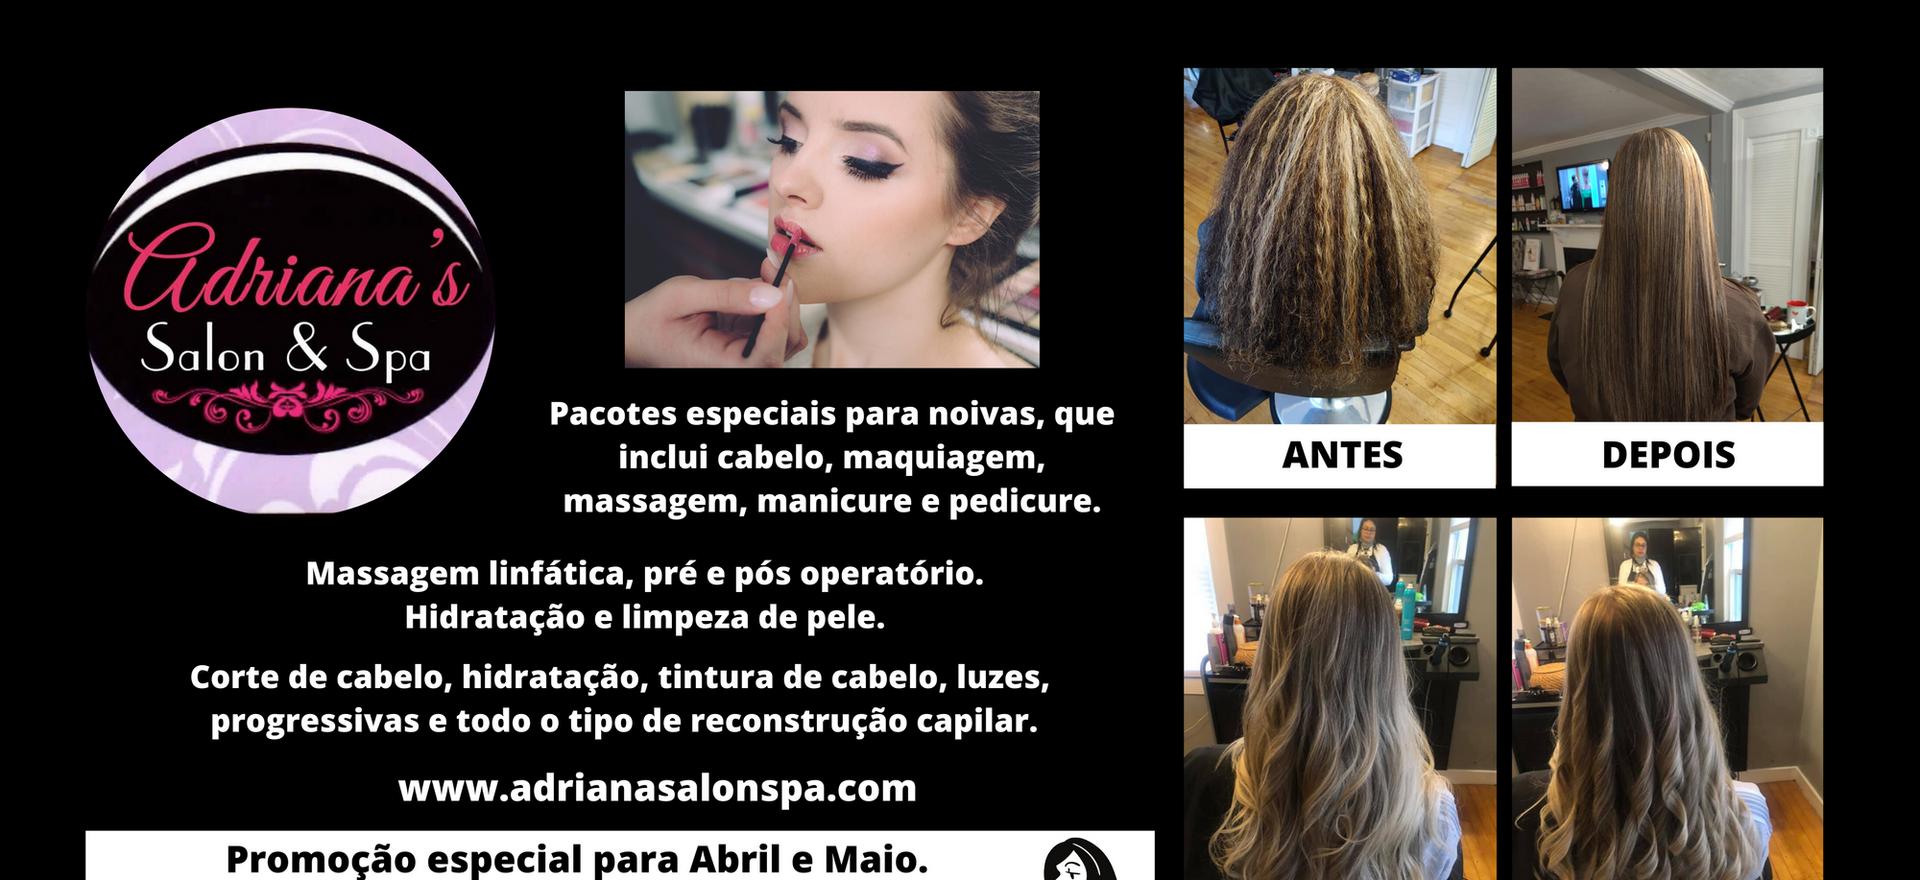 Adriana's salon.png